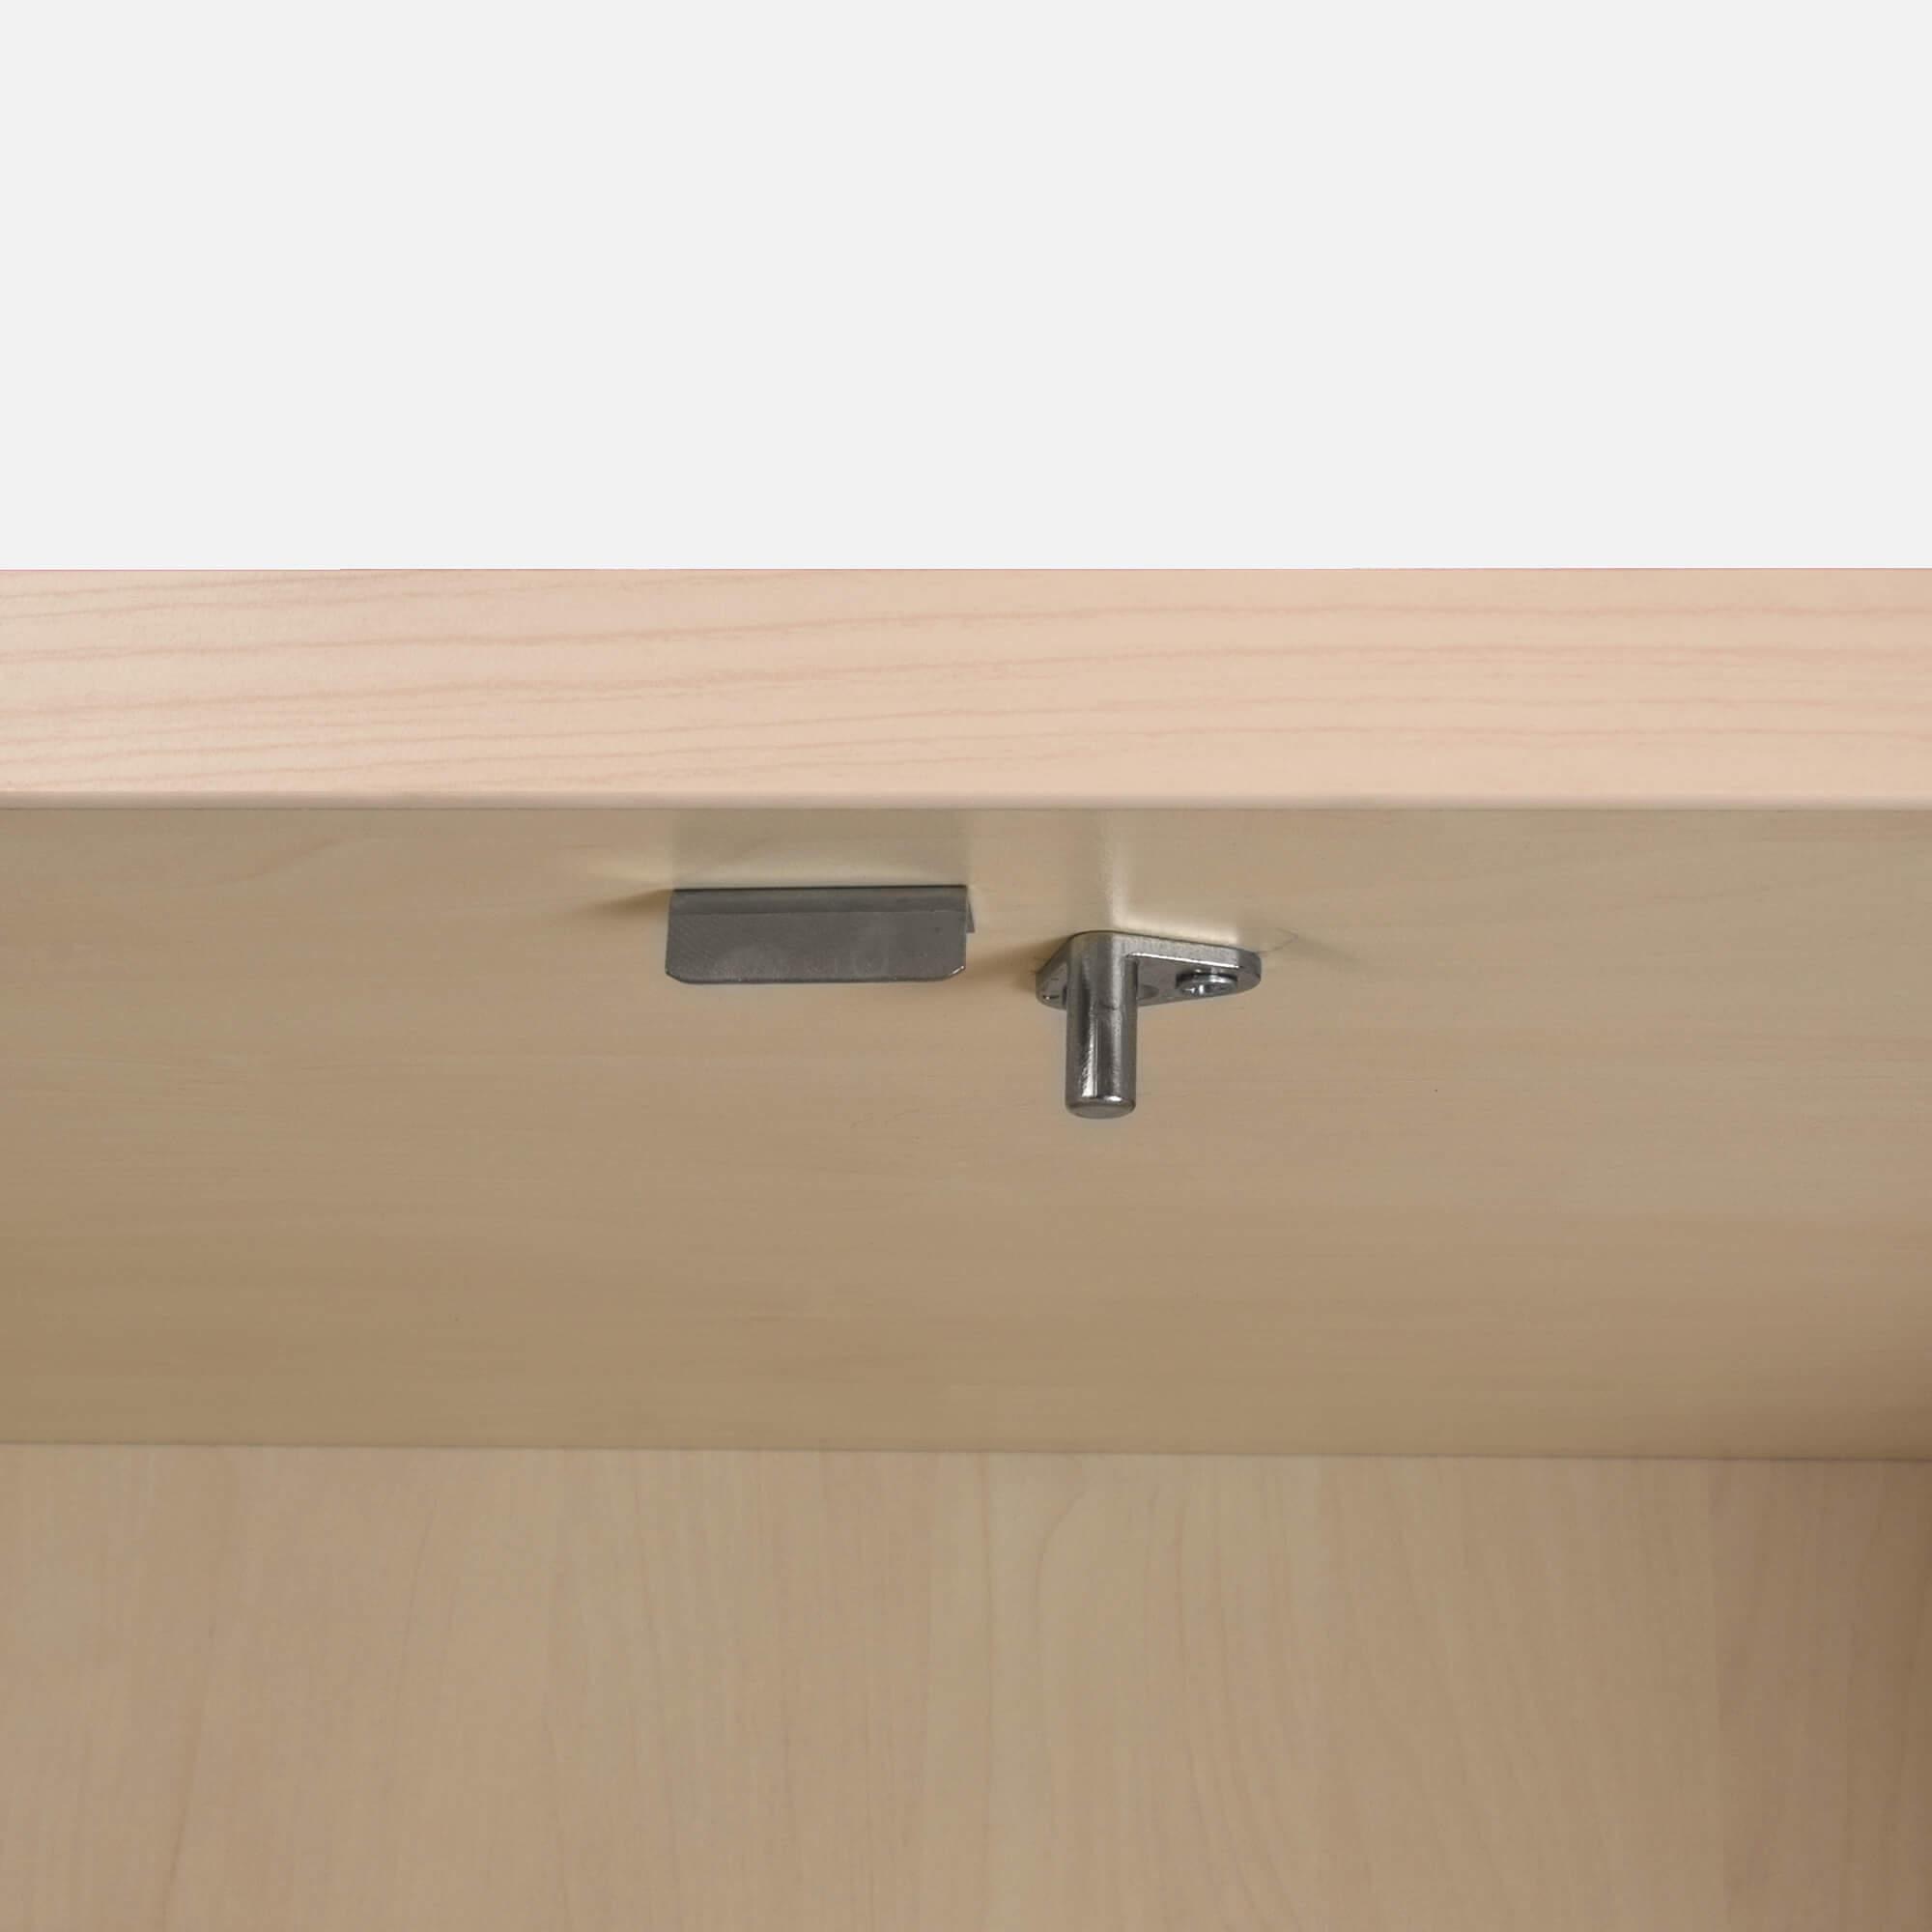 PROFI Aktenschrank abschließbar 5 OH Weiß-Ahorn Schrank Büroschrank Flügeltürenschrank